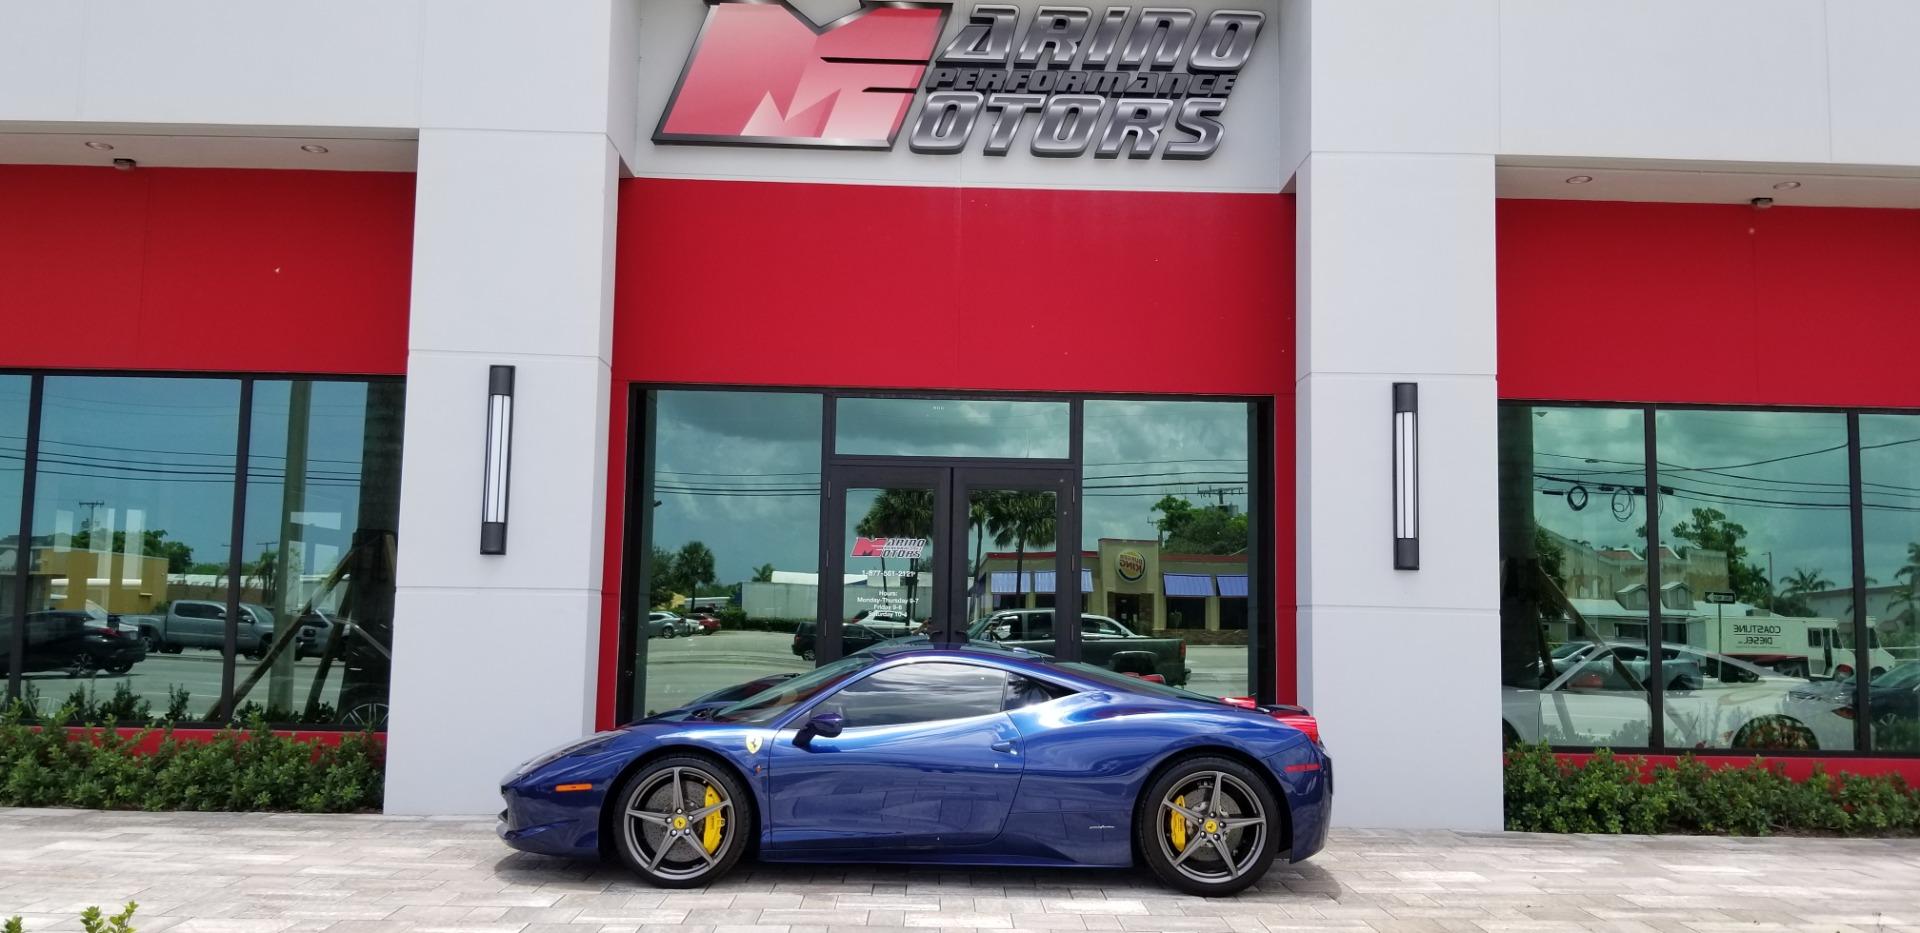 Used 2011 Ferrari 458 Italia For Sale 179900 Marino